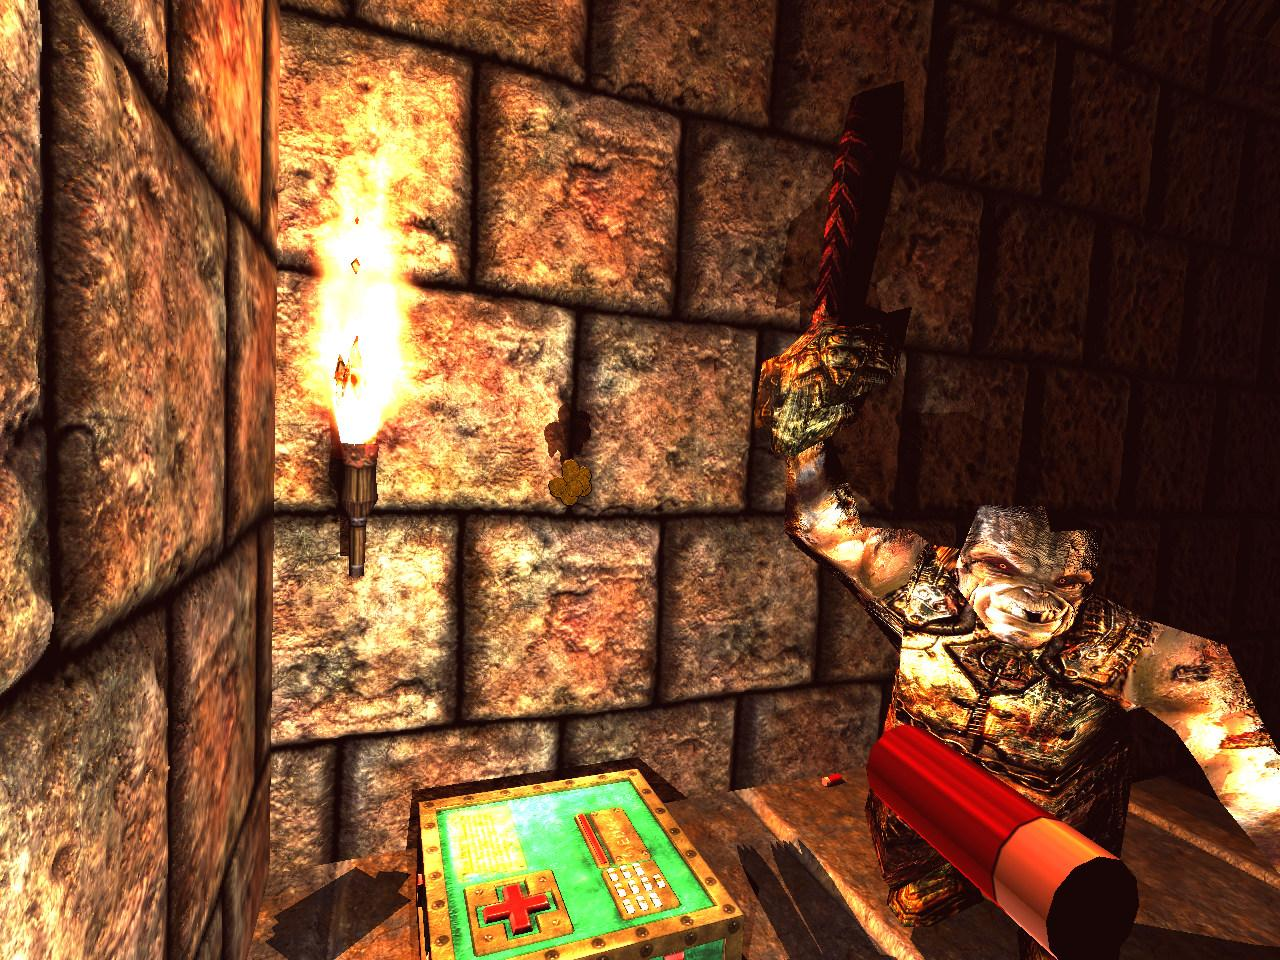 Quake Reforged - Bestiary - Quake - The Ogre Quake 1 Monsters